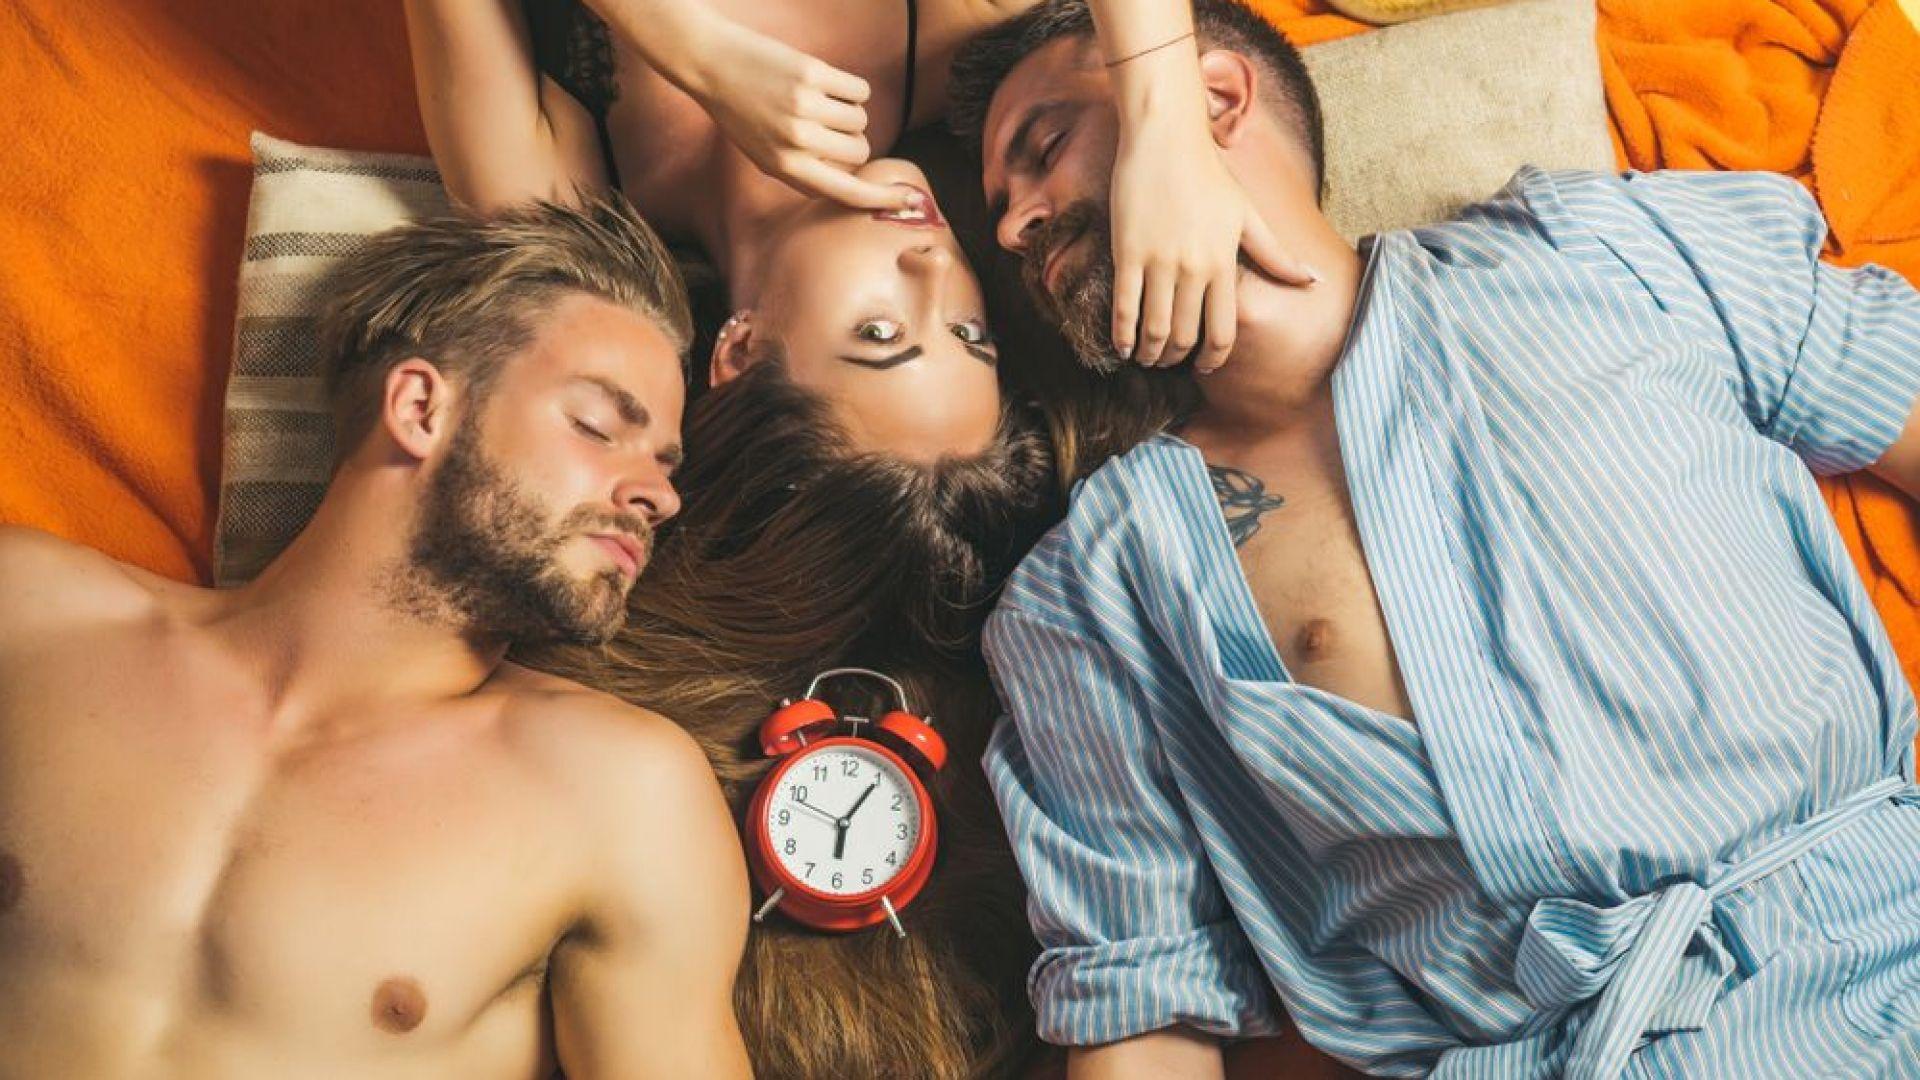 Секс хороскоп за ноември